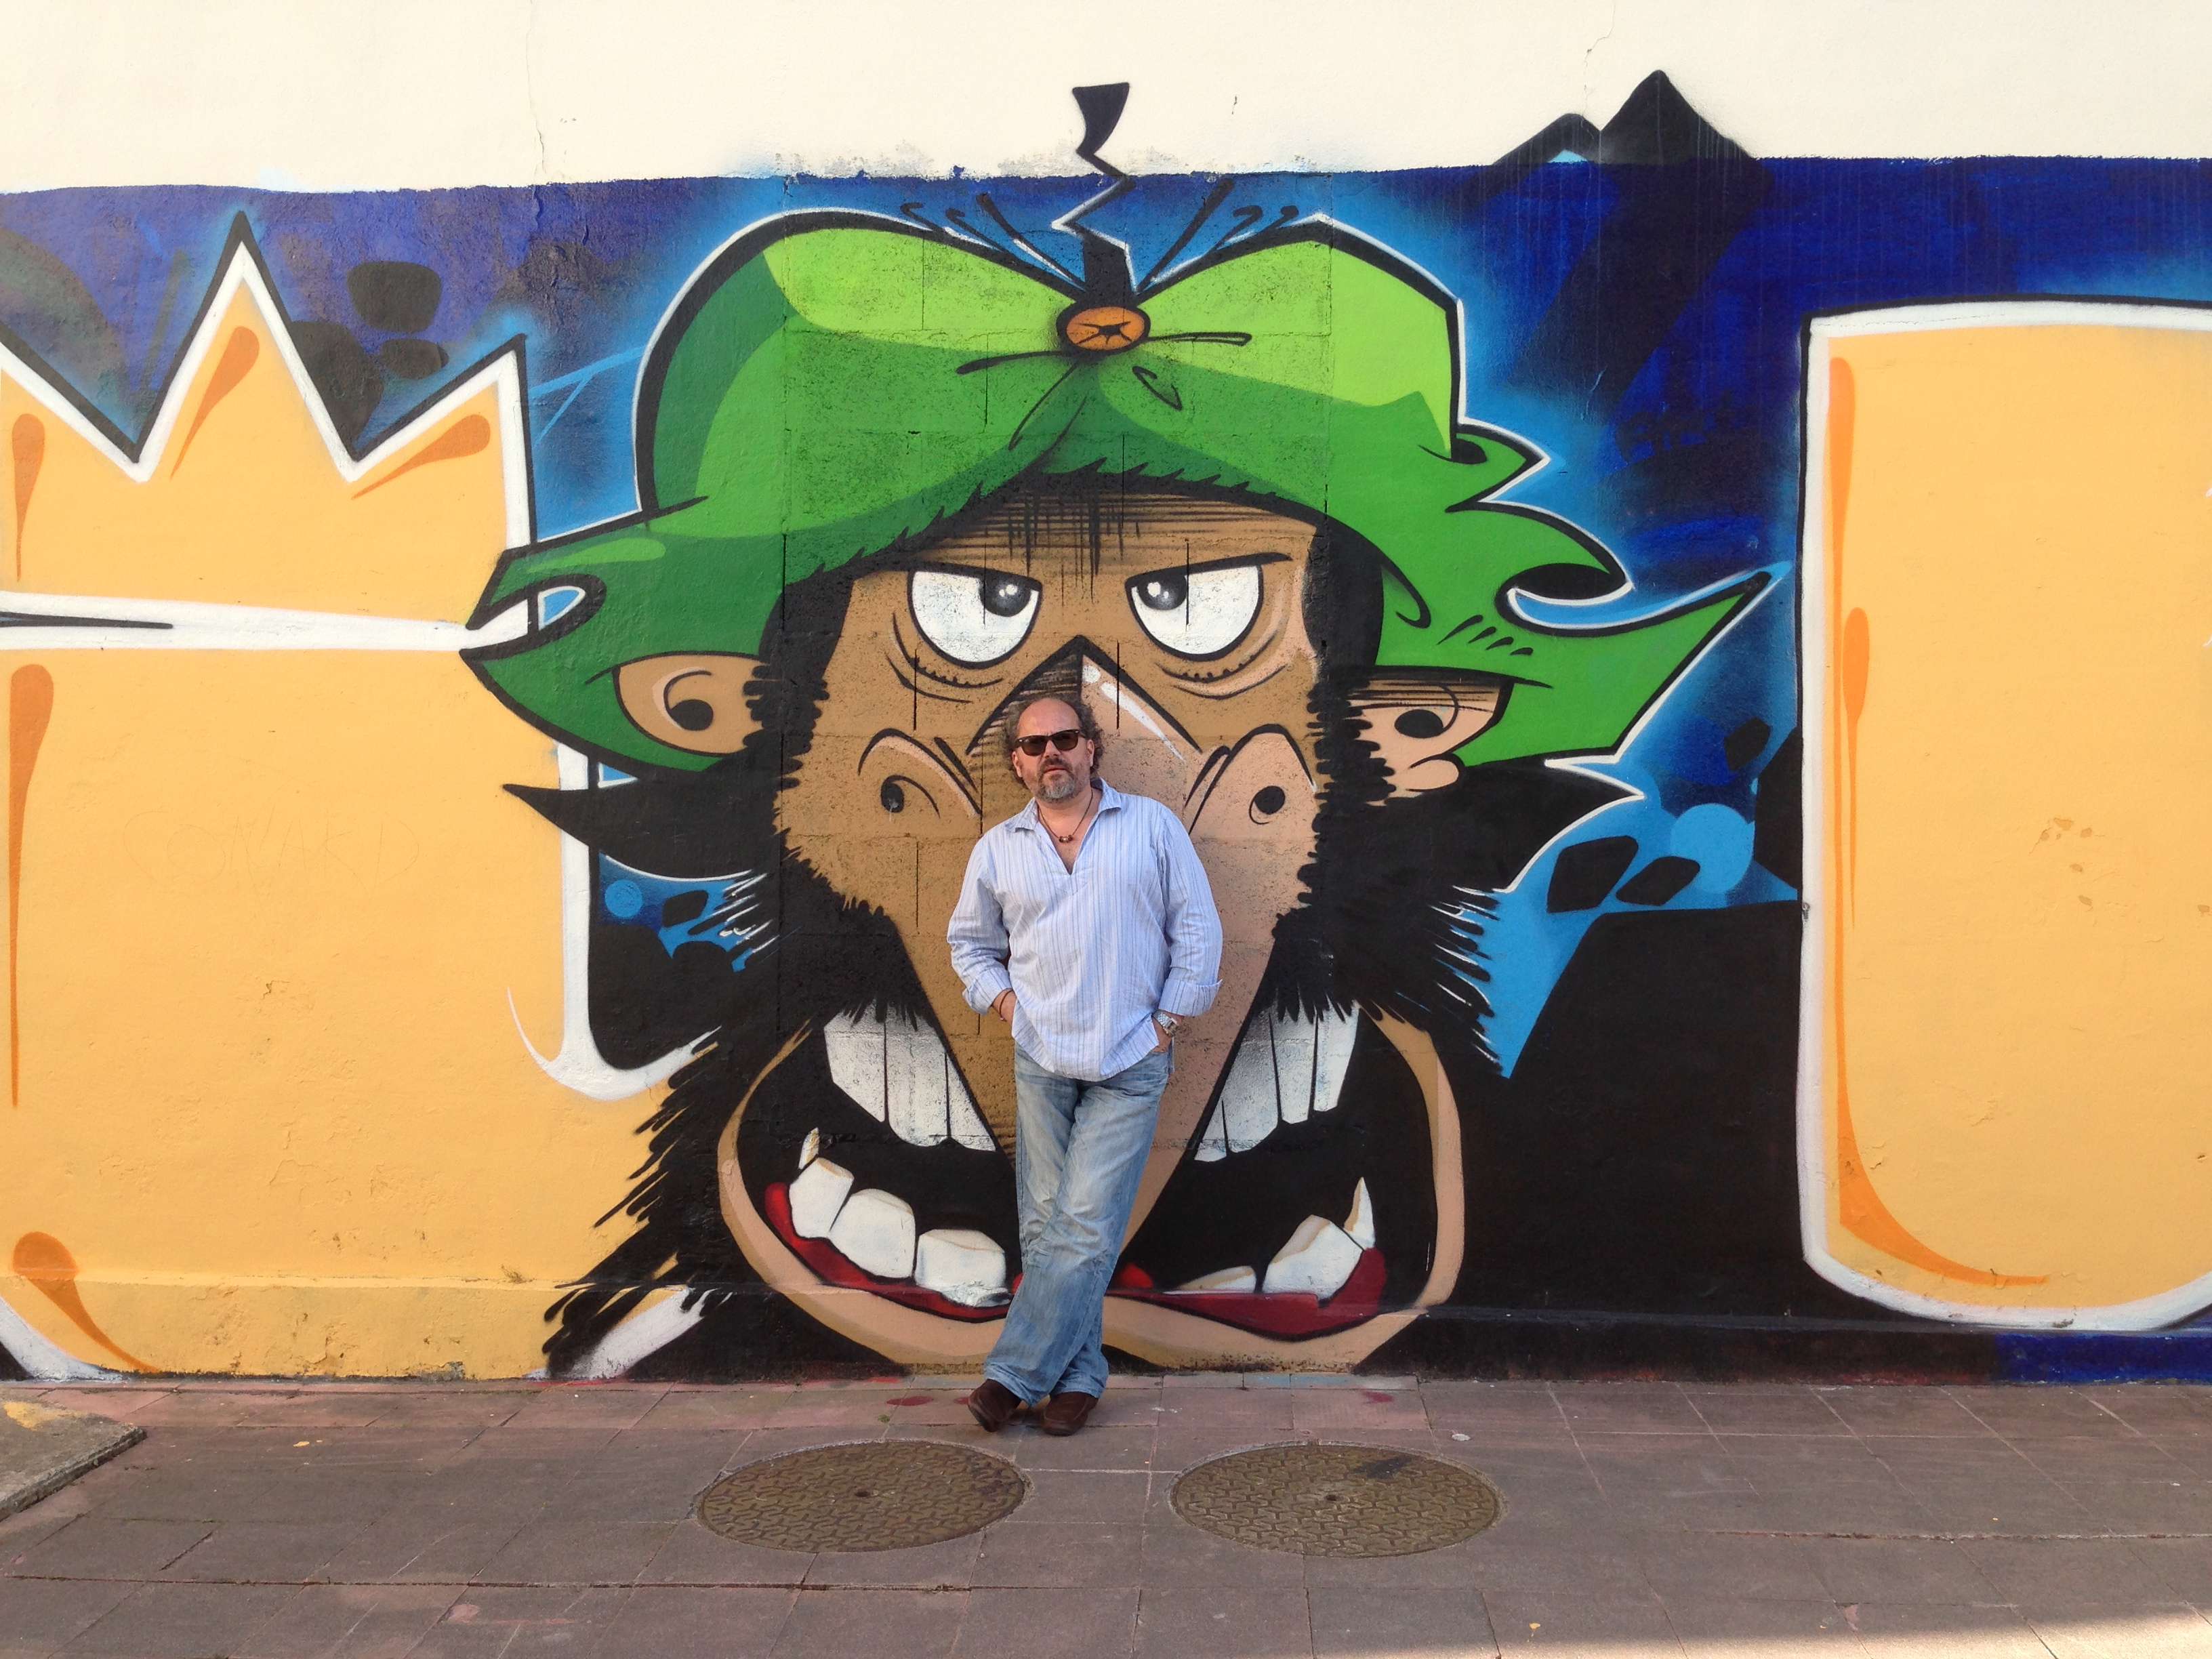 fresque - Iznogoud - Thibault Esonier - Graffitti